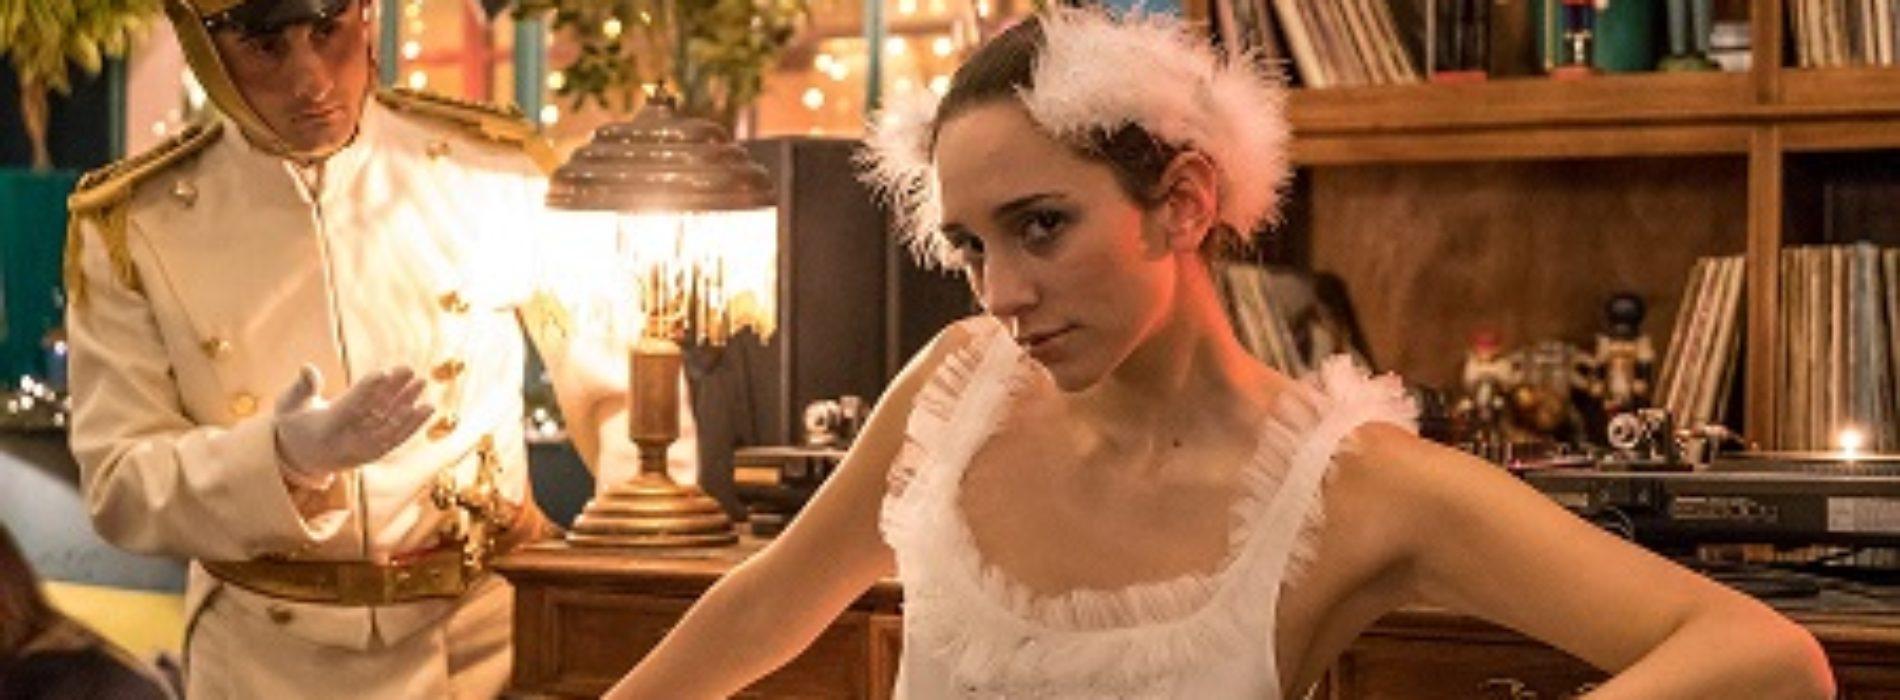 Carnevale 2018 a Roma, cene ma anche party e djset